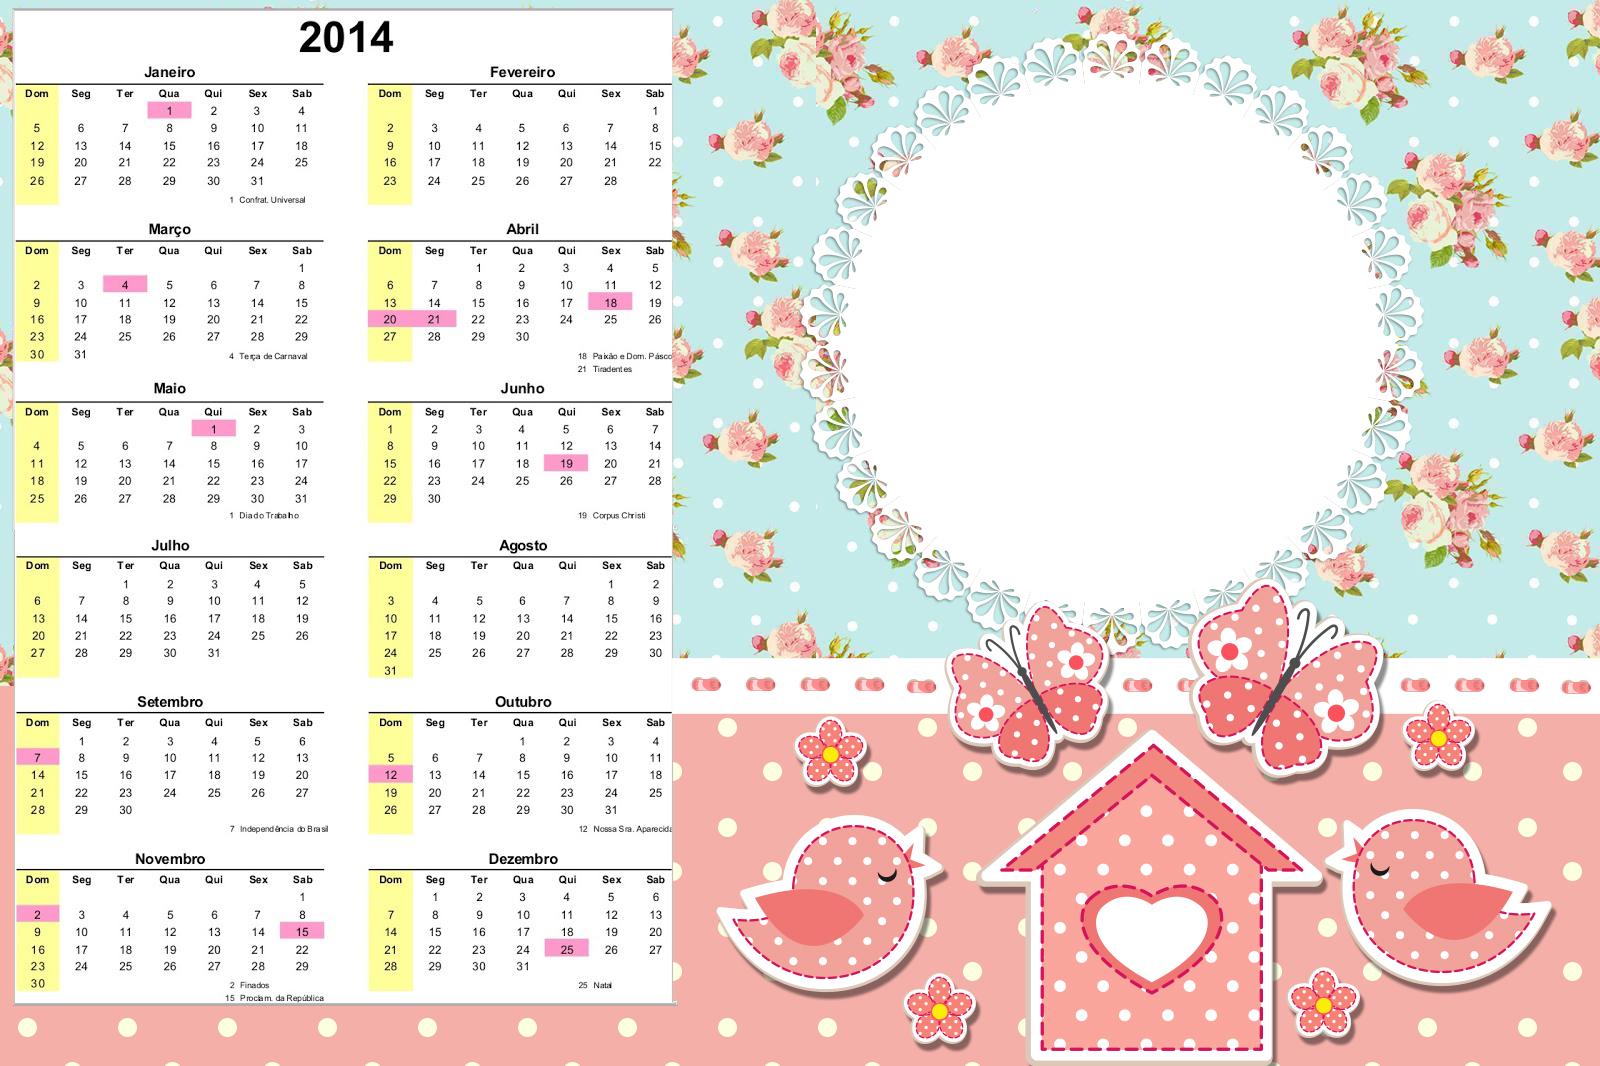 imagens de jardim encantado para convites:Convite Calendário 2014 Jardim Encantado Vintage Floral: